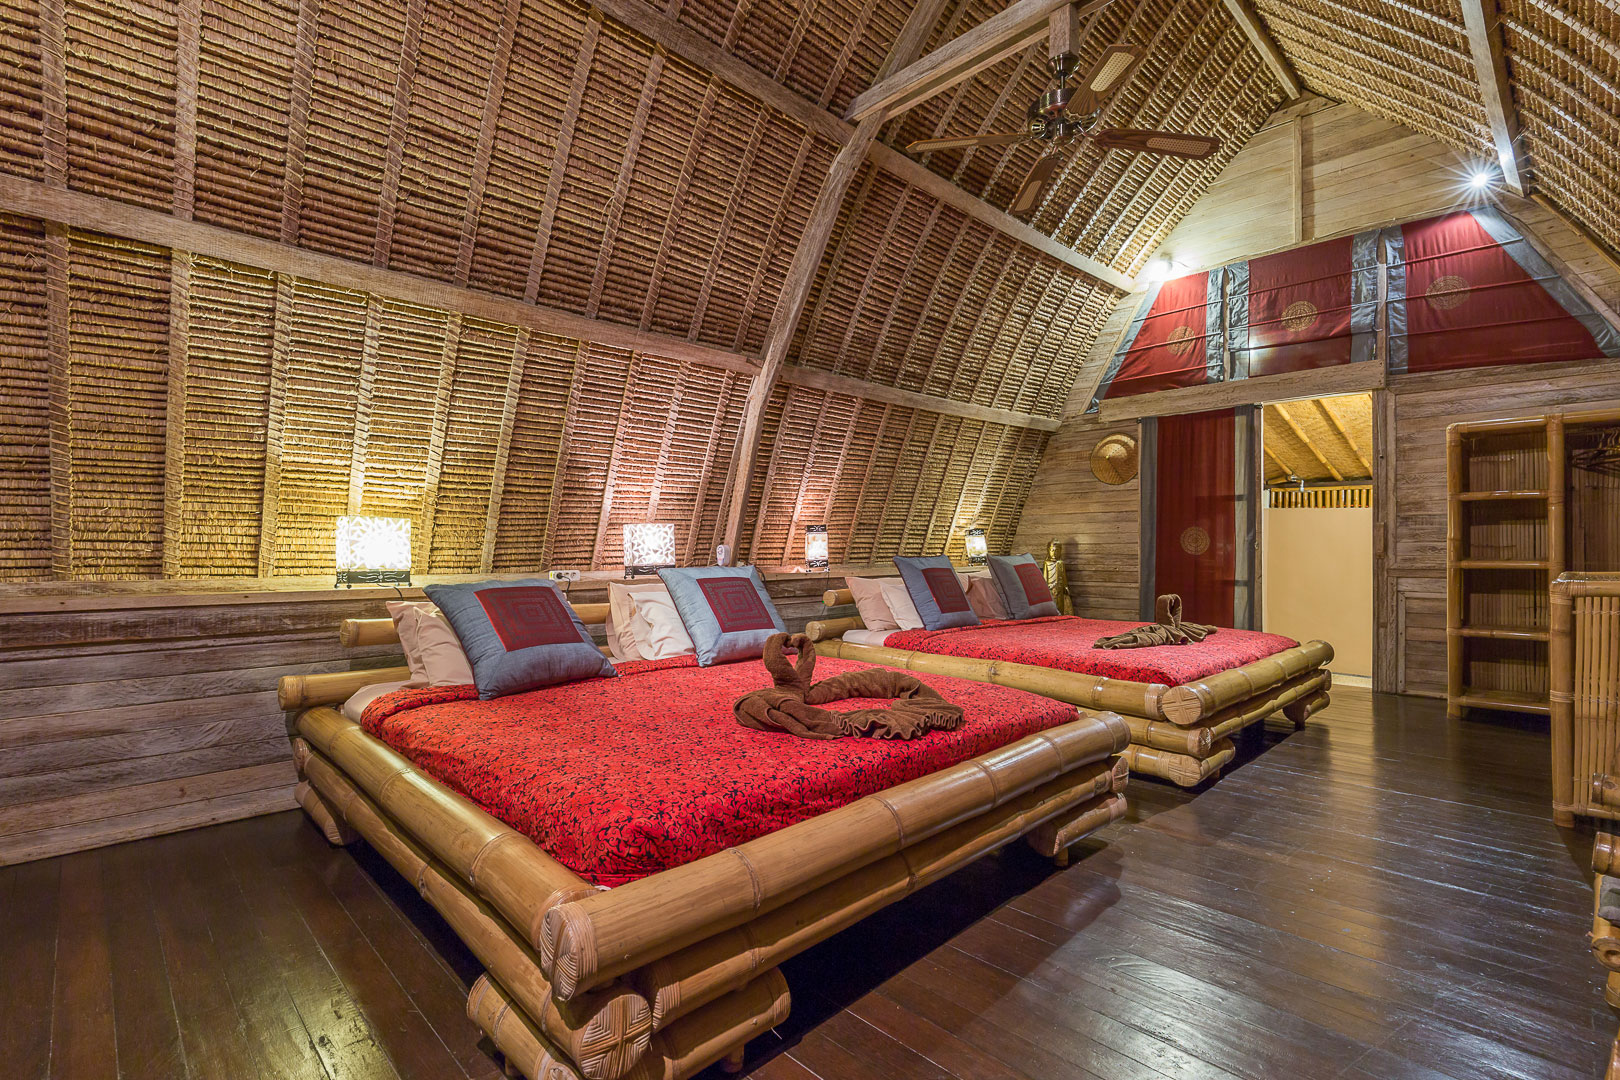 Location-bungalows-maison-hote-hotel-milos-home-L7-rhodochrosite-2